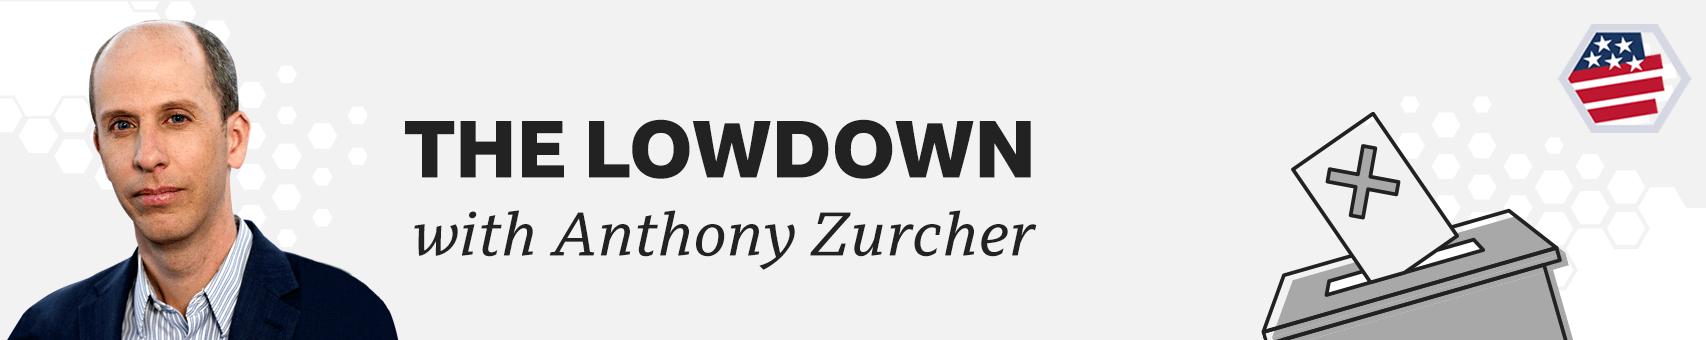 The Lowdown branding